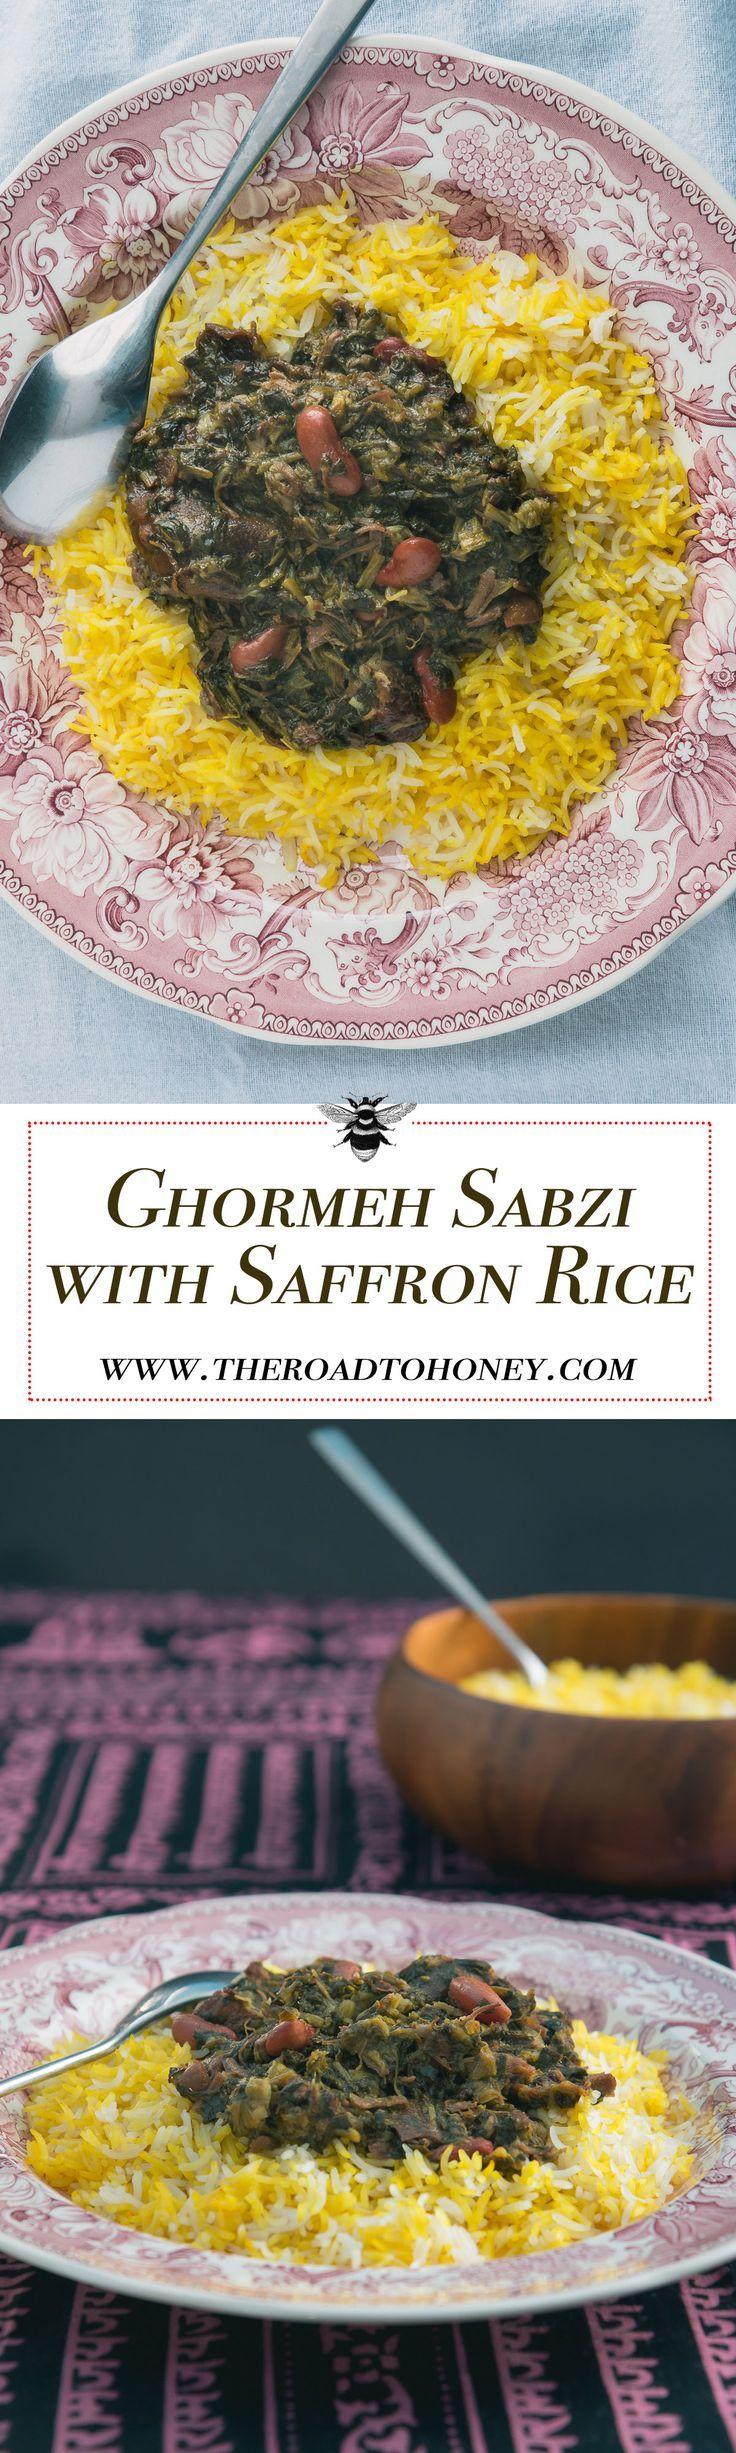 Ghormeh Sabzi with Saffron Rice & Tahdig (crispy rice)